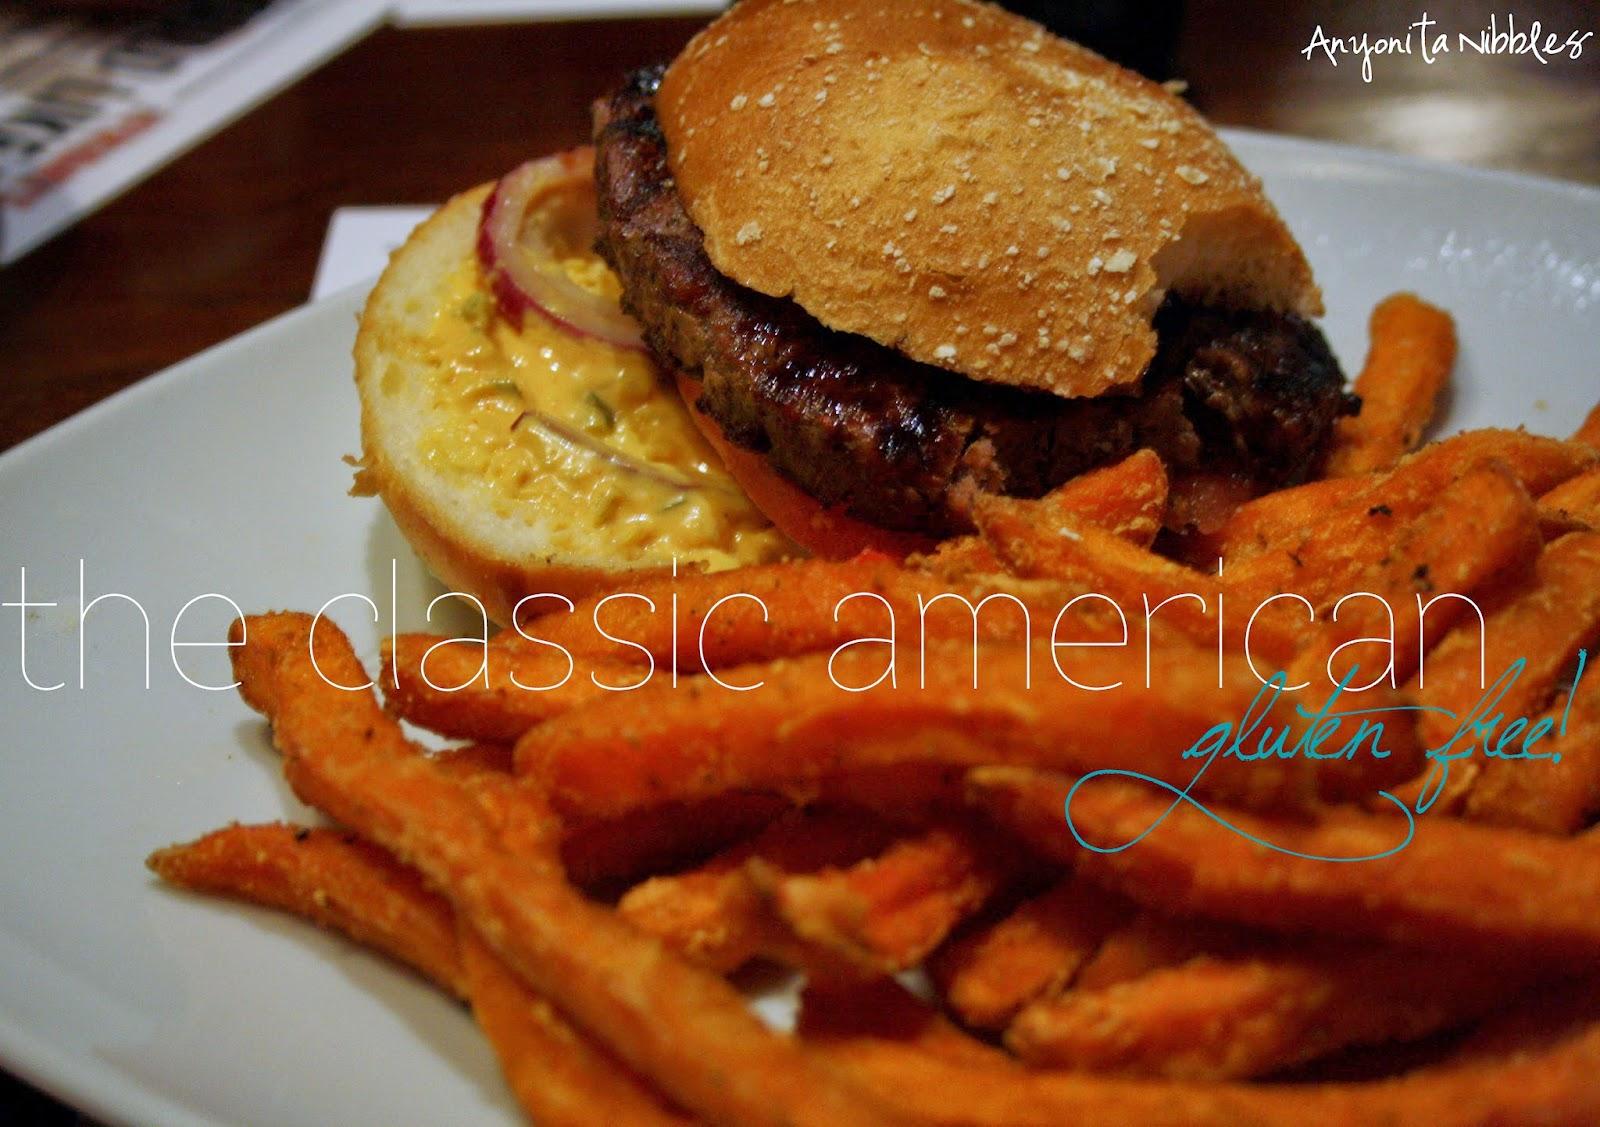 TGI Friday's Gluten Free, Classic American burger